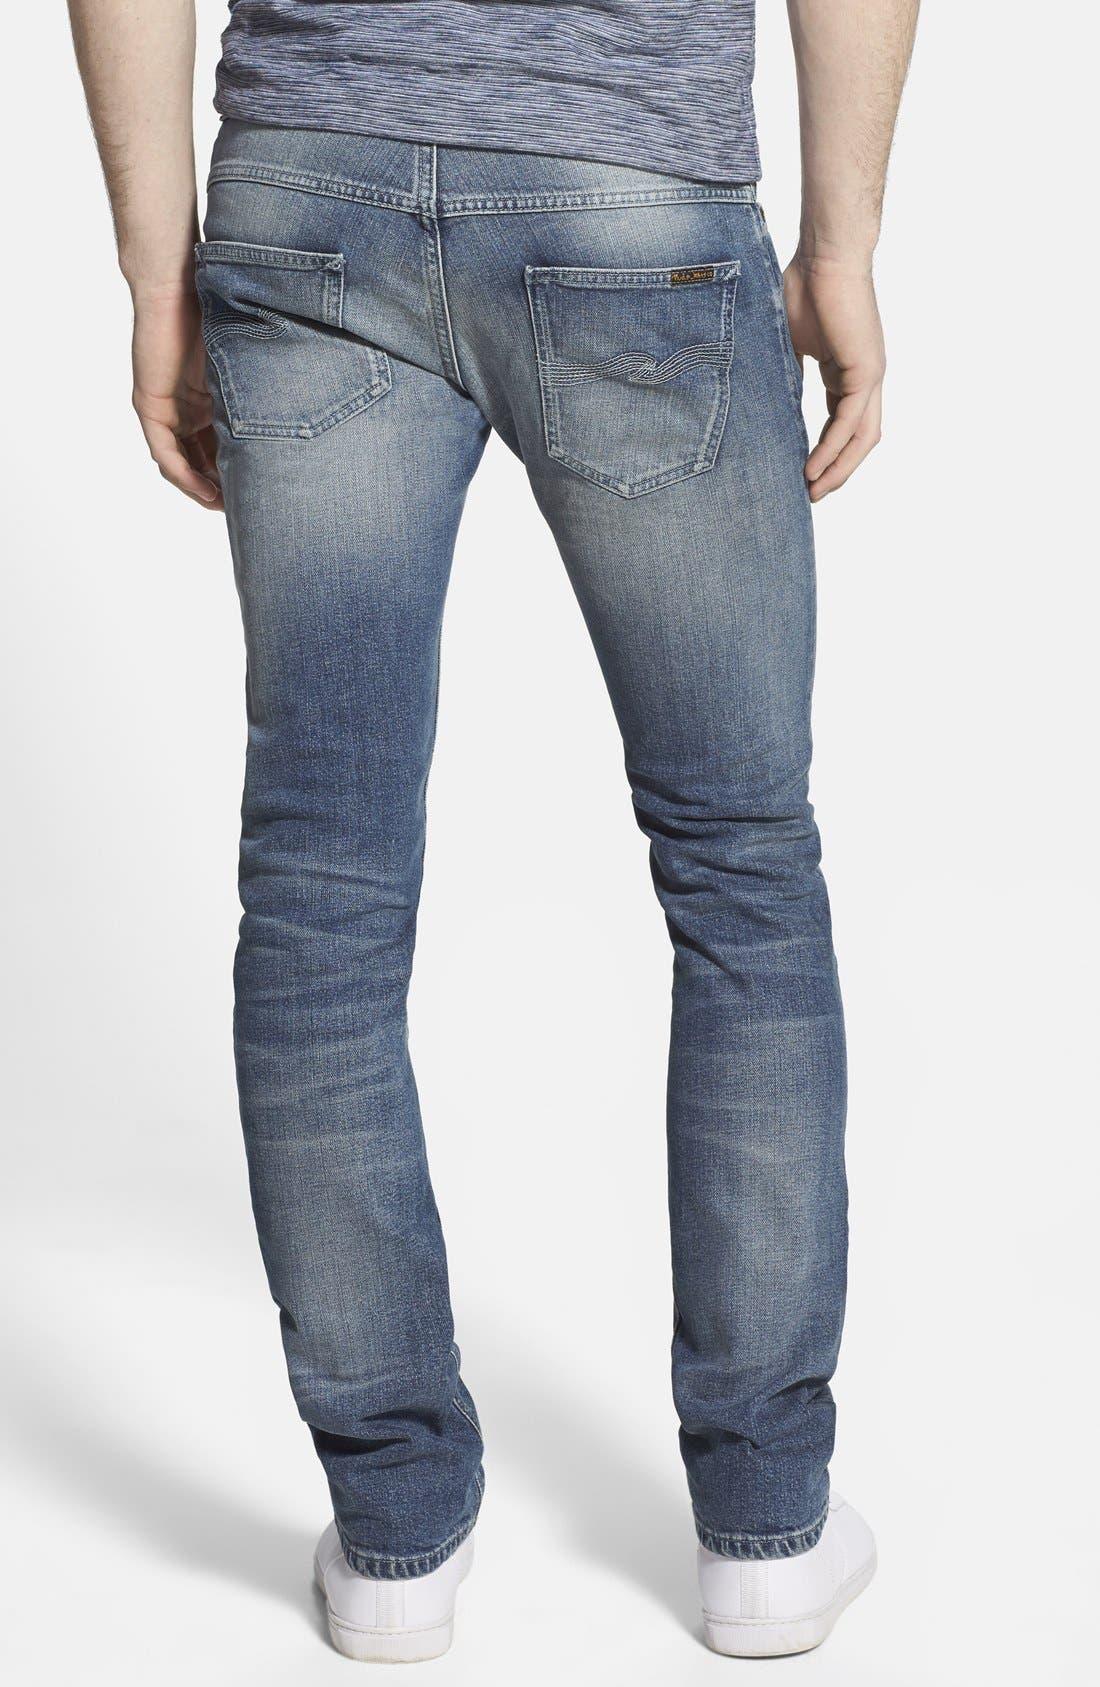 'Thin Finn' Skinny Fit Jeans,                             Alternate thumbnail 3, color,                             401